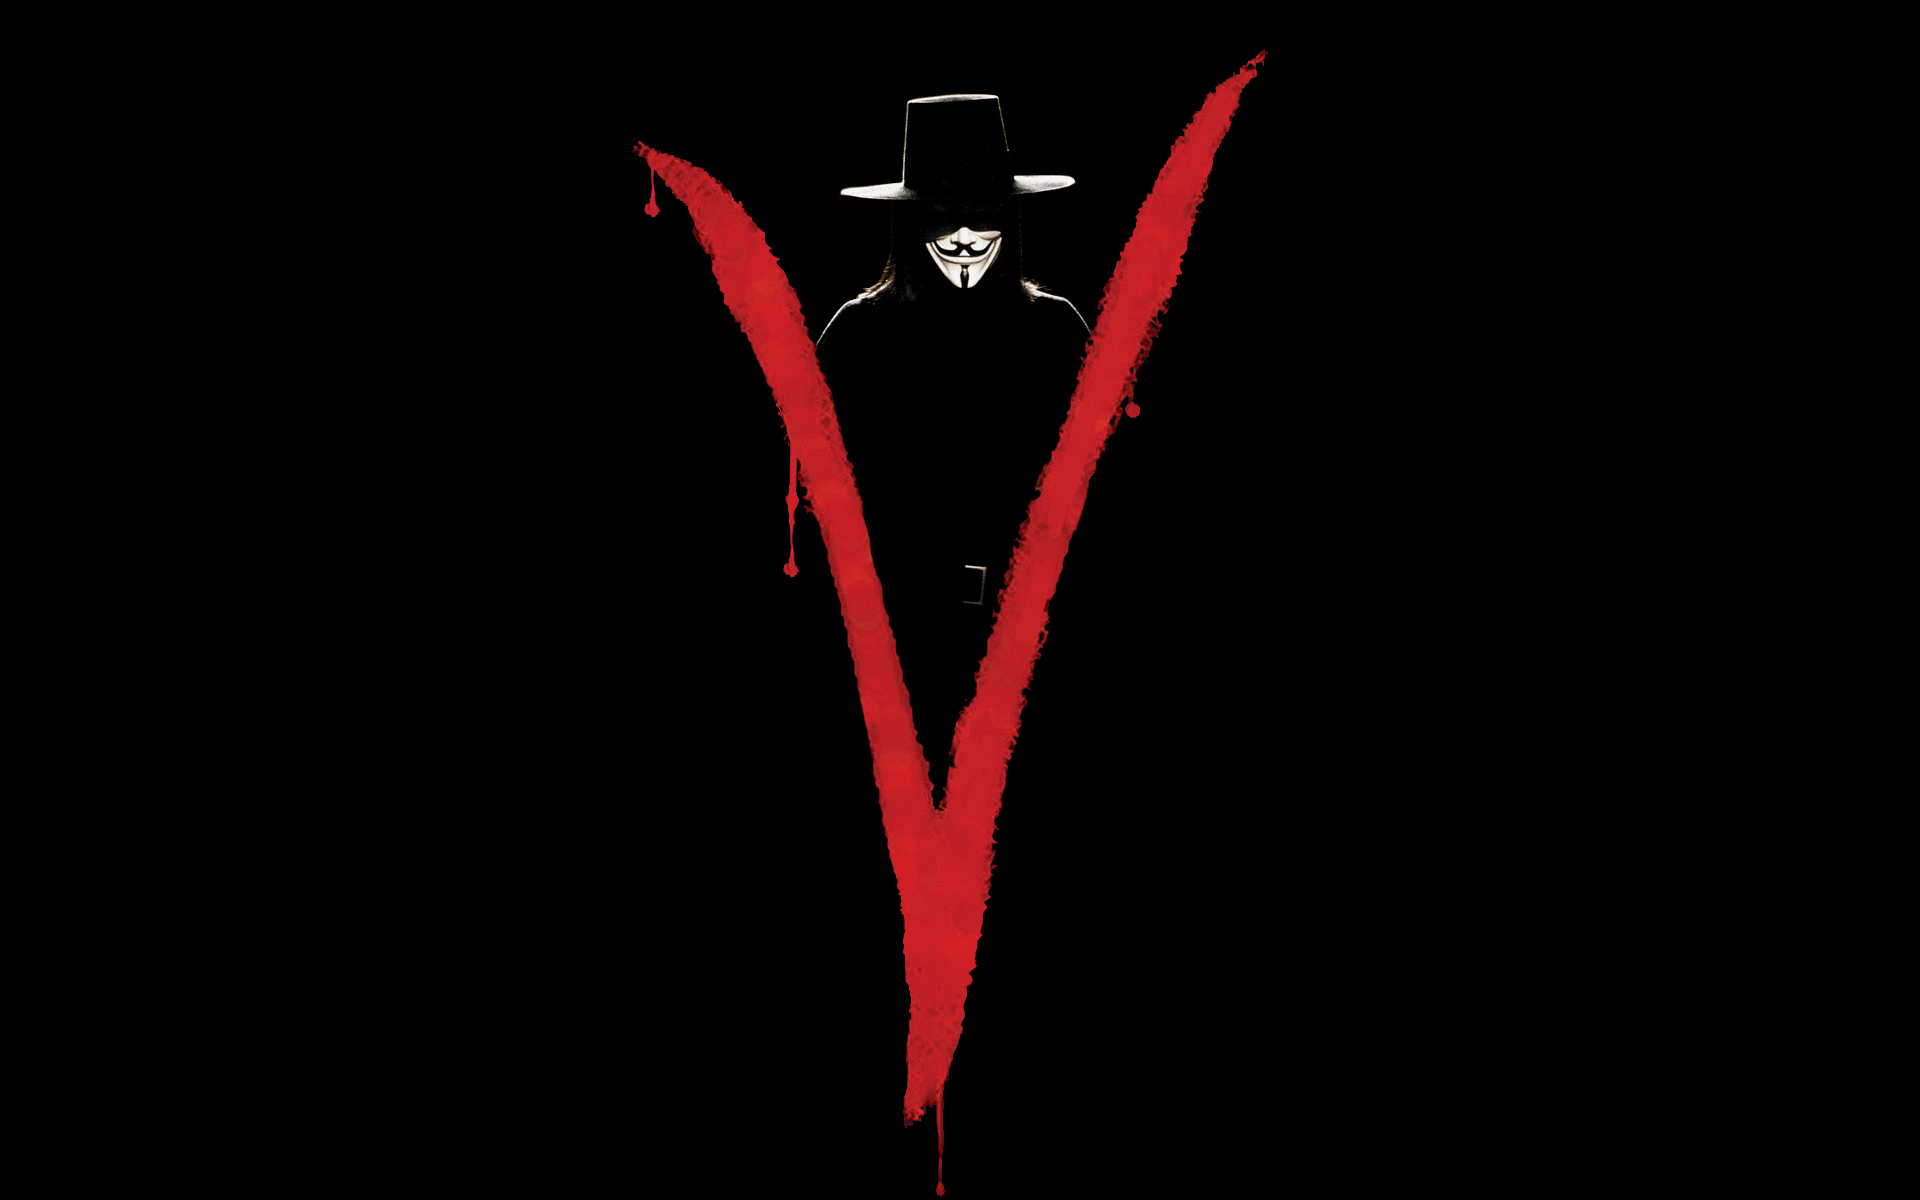 V For Vendetta Full HD Wallpaper And Background Image